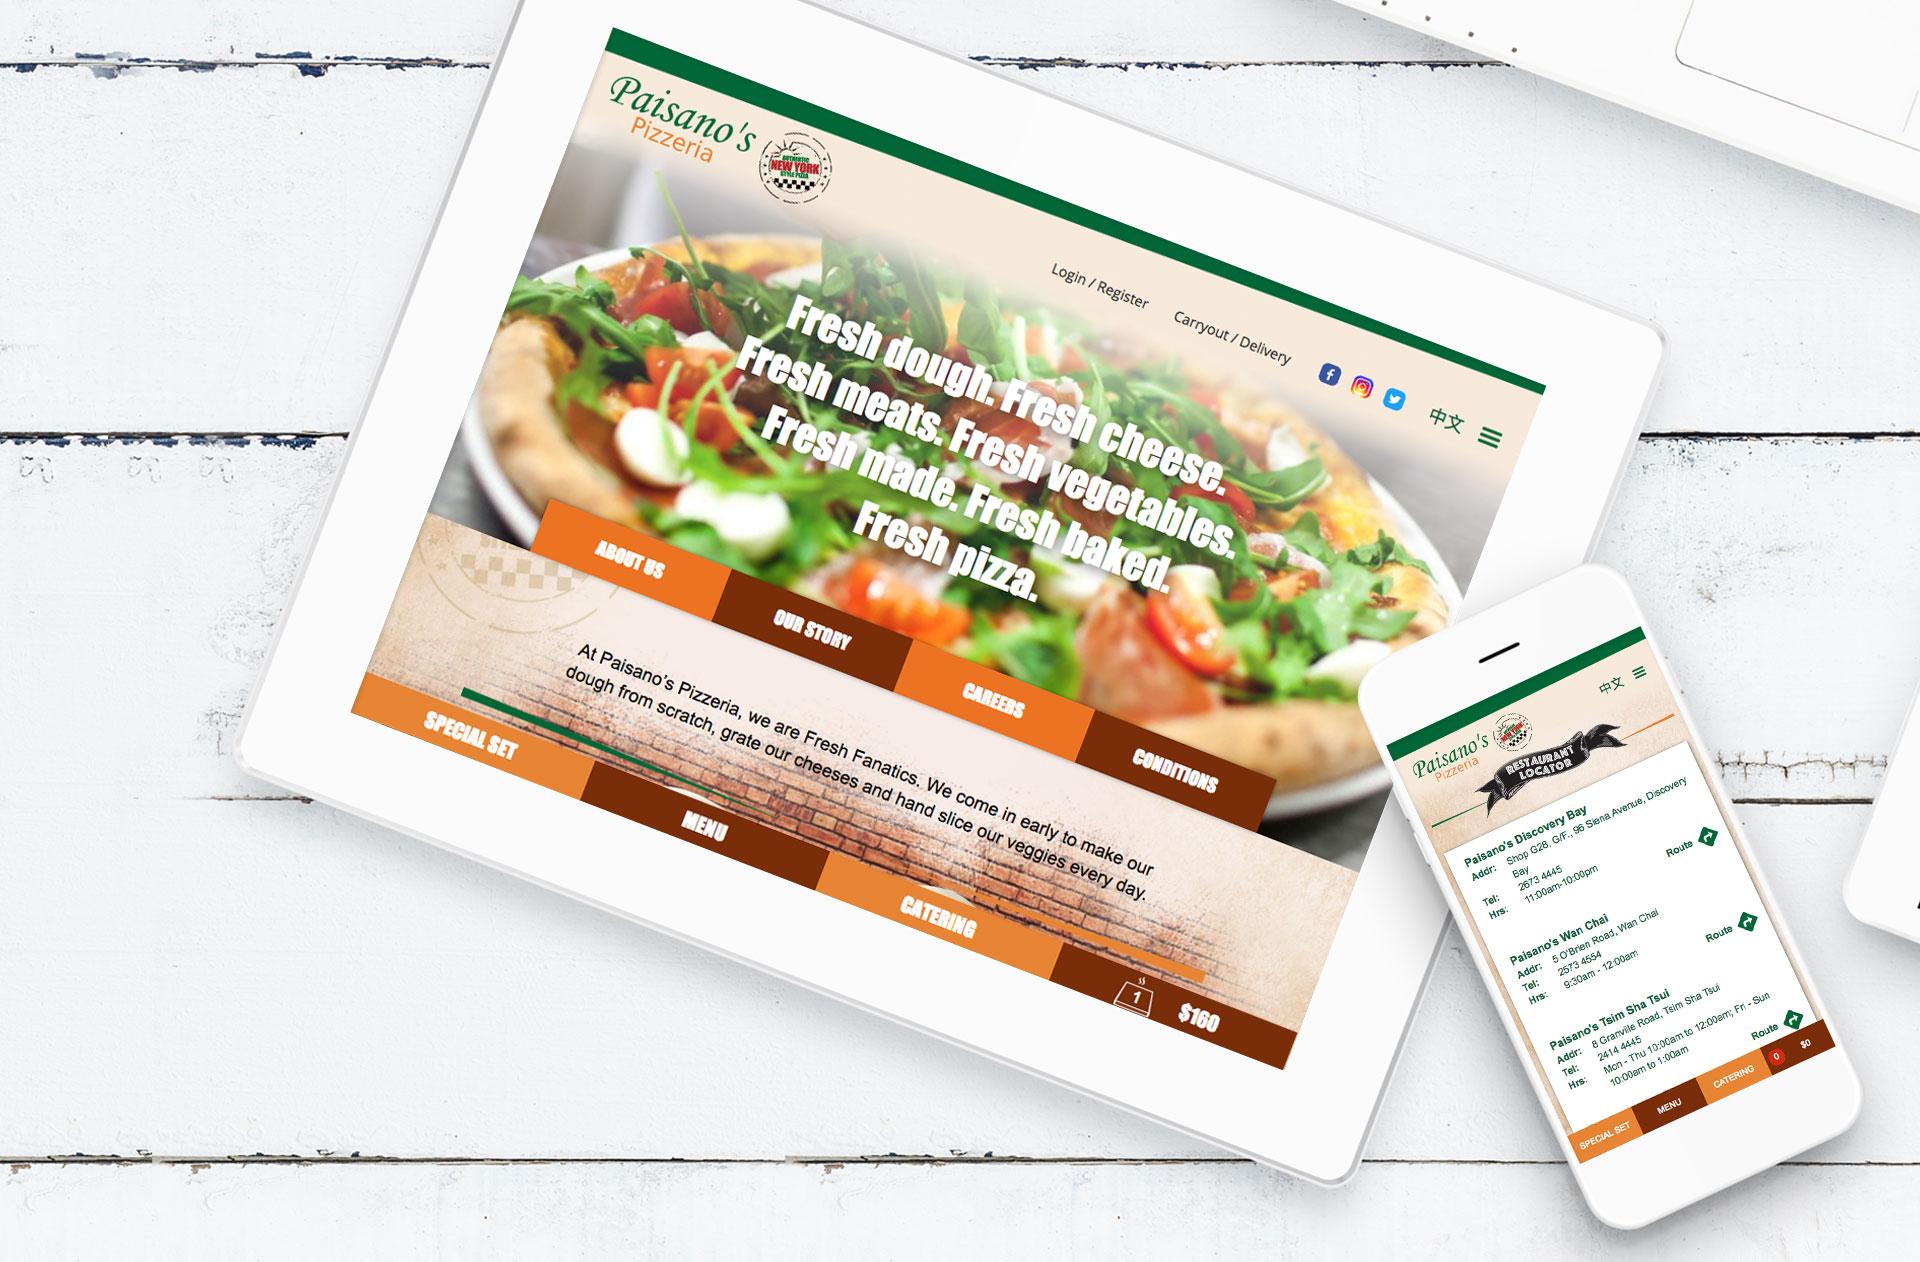 Web Design Paisano's Pizzeria